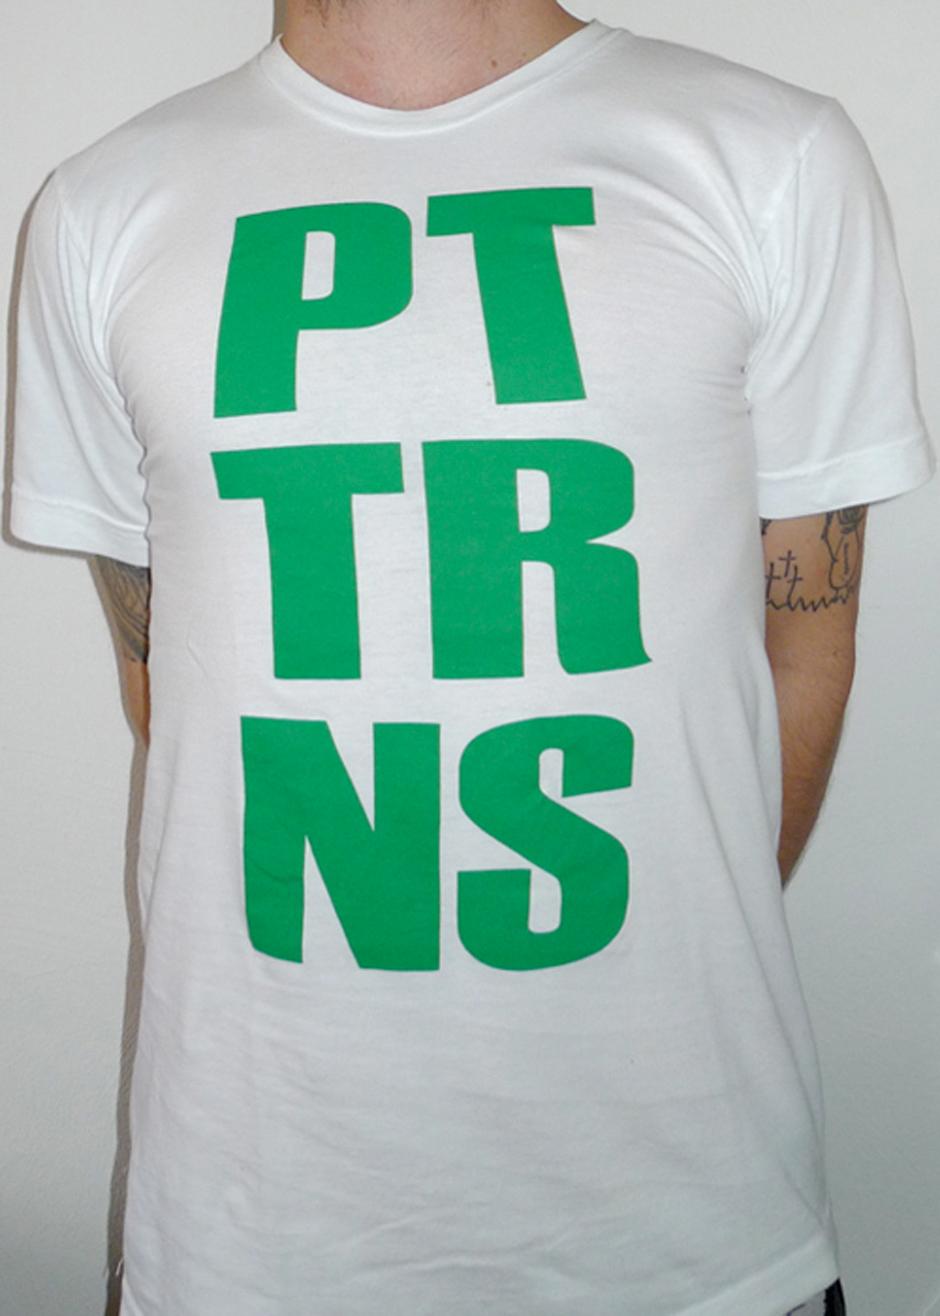 PTTRNS